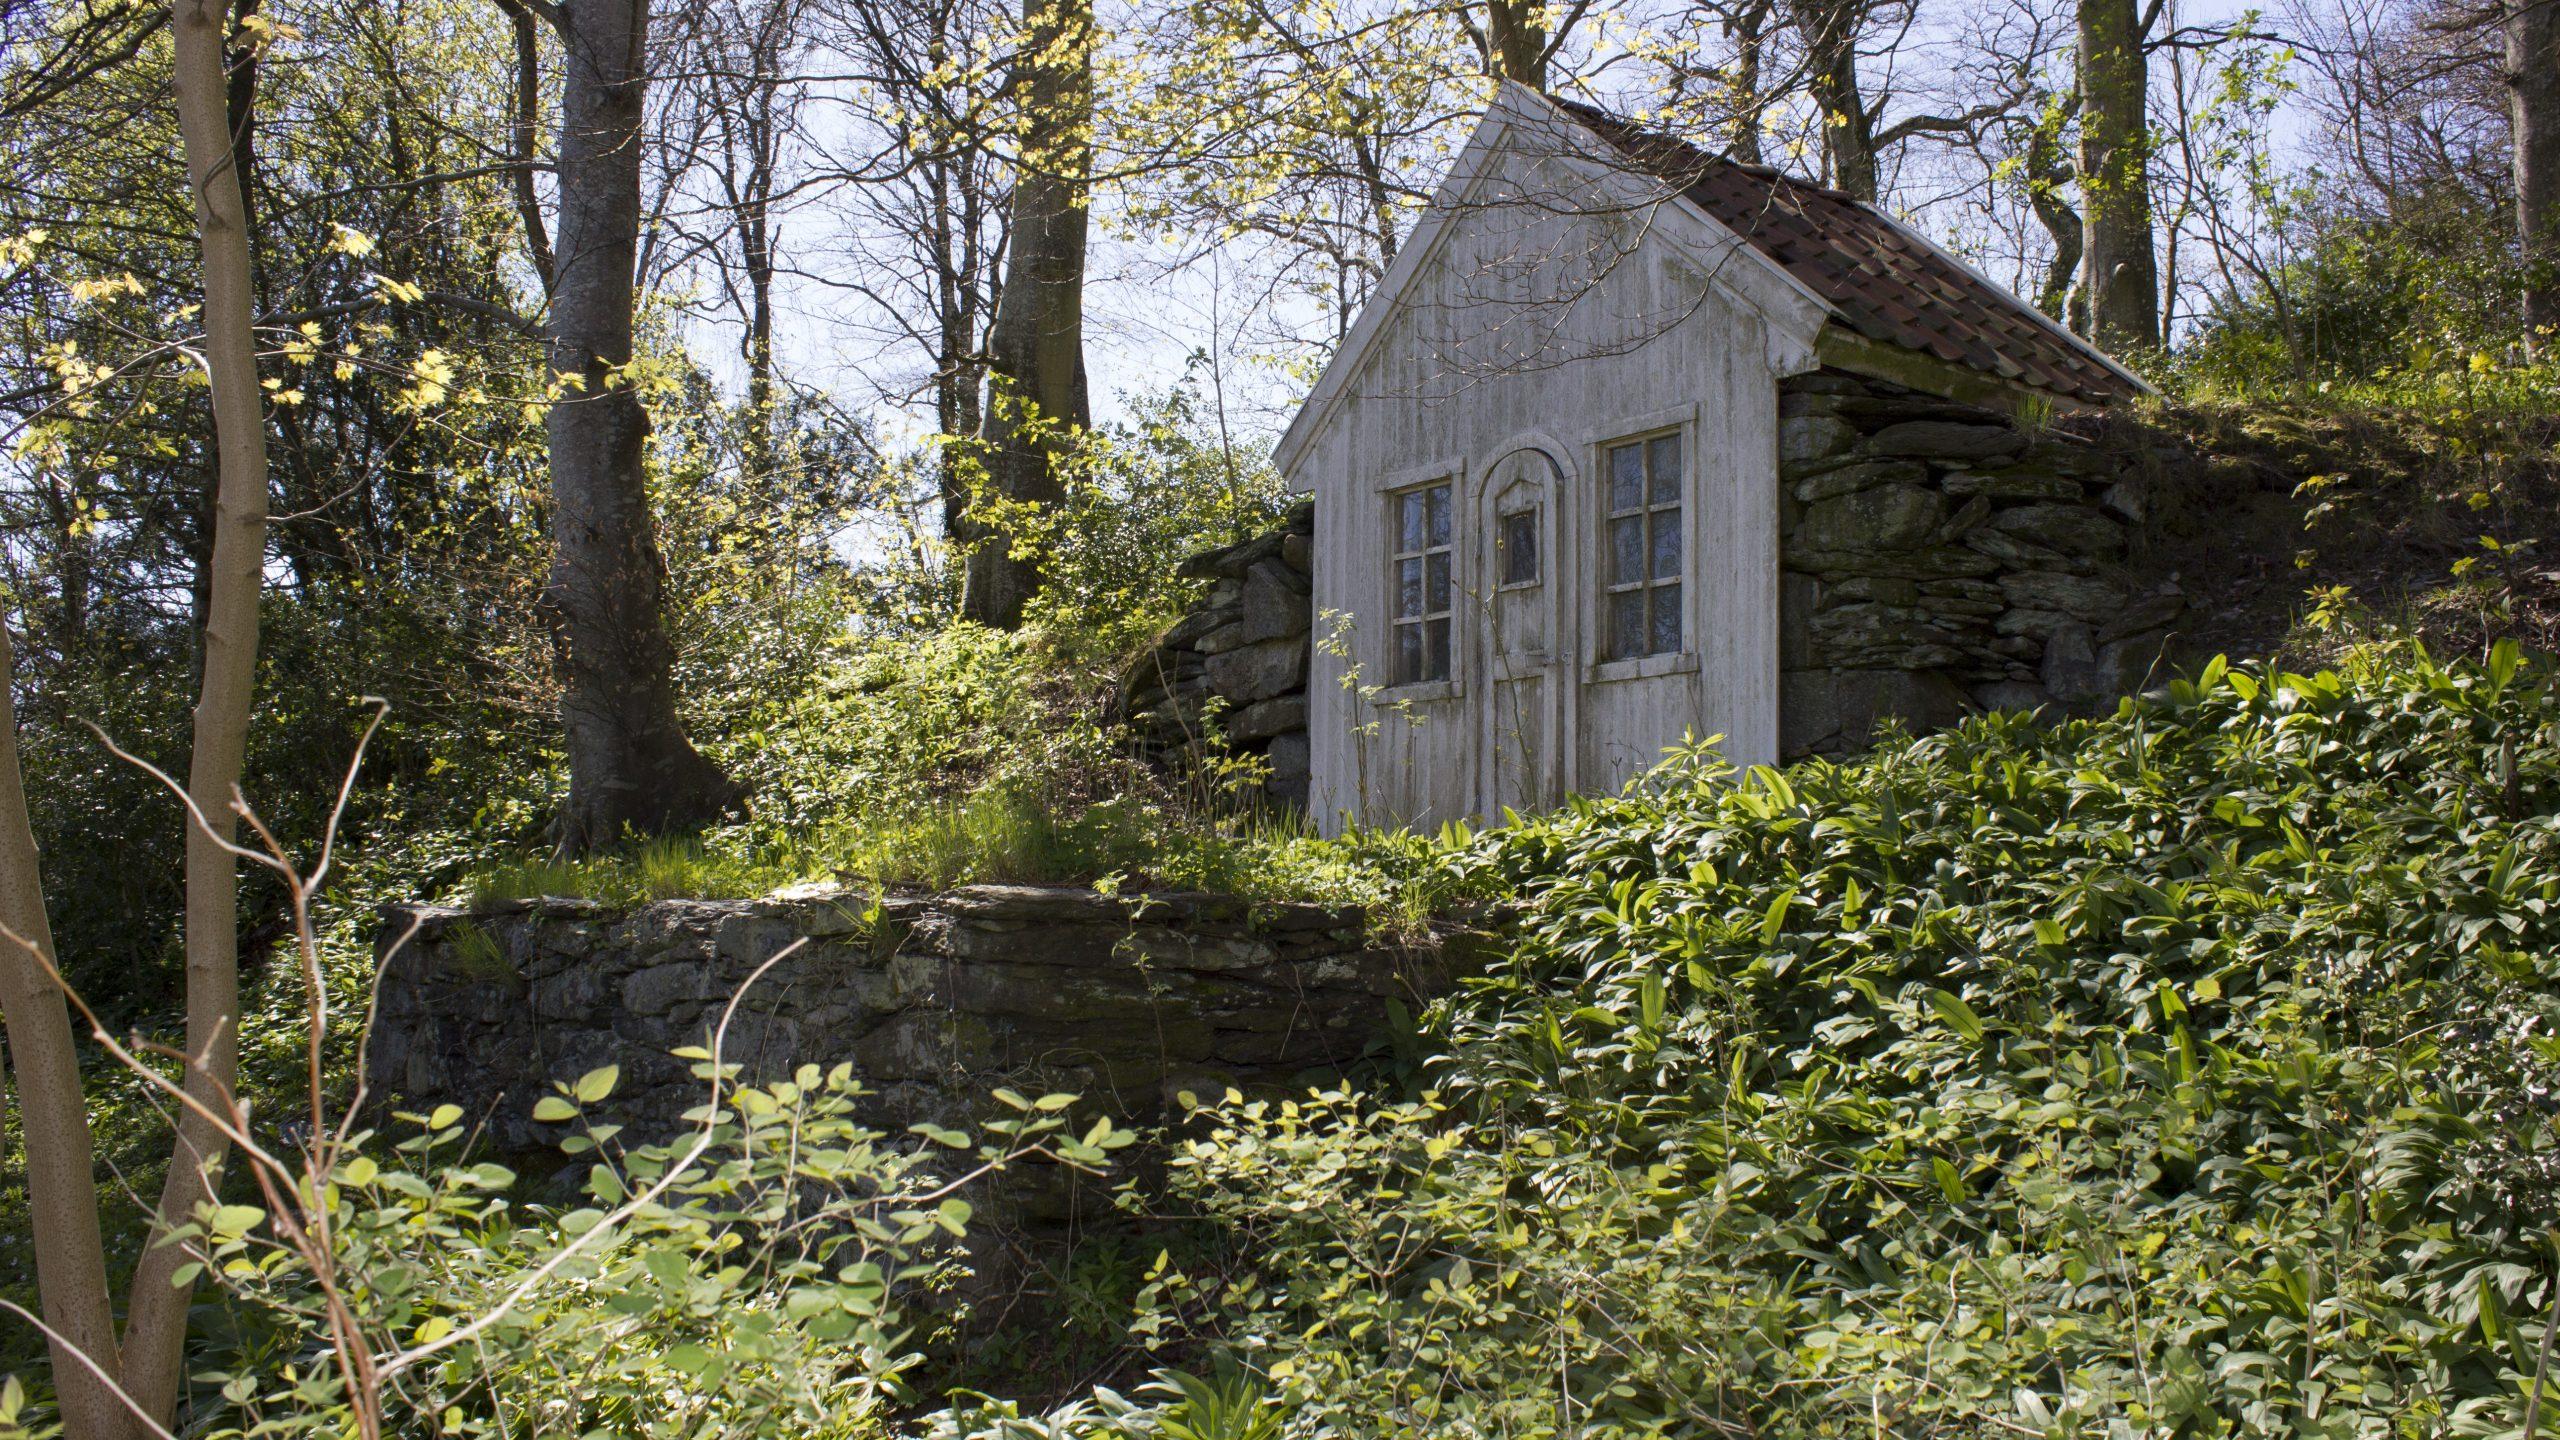 Bilde av Lysthuset «Helmichs Minde», huset er utformet som en grotte med gavlfasade i tre.. Foto er tatt av Per David Martinsen, Riksantikvaren